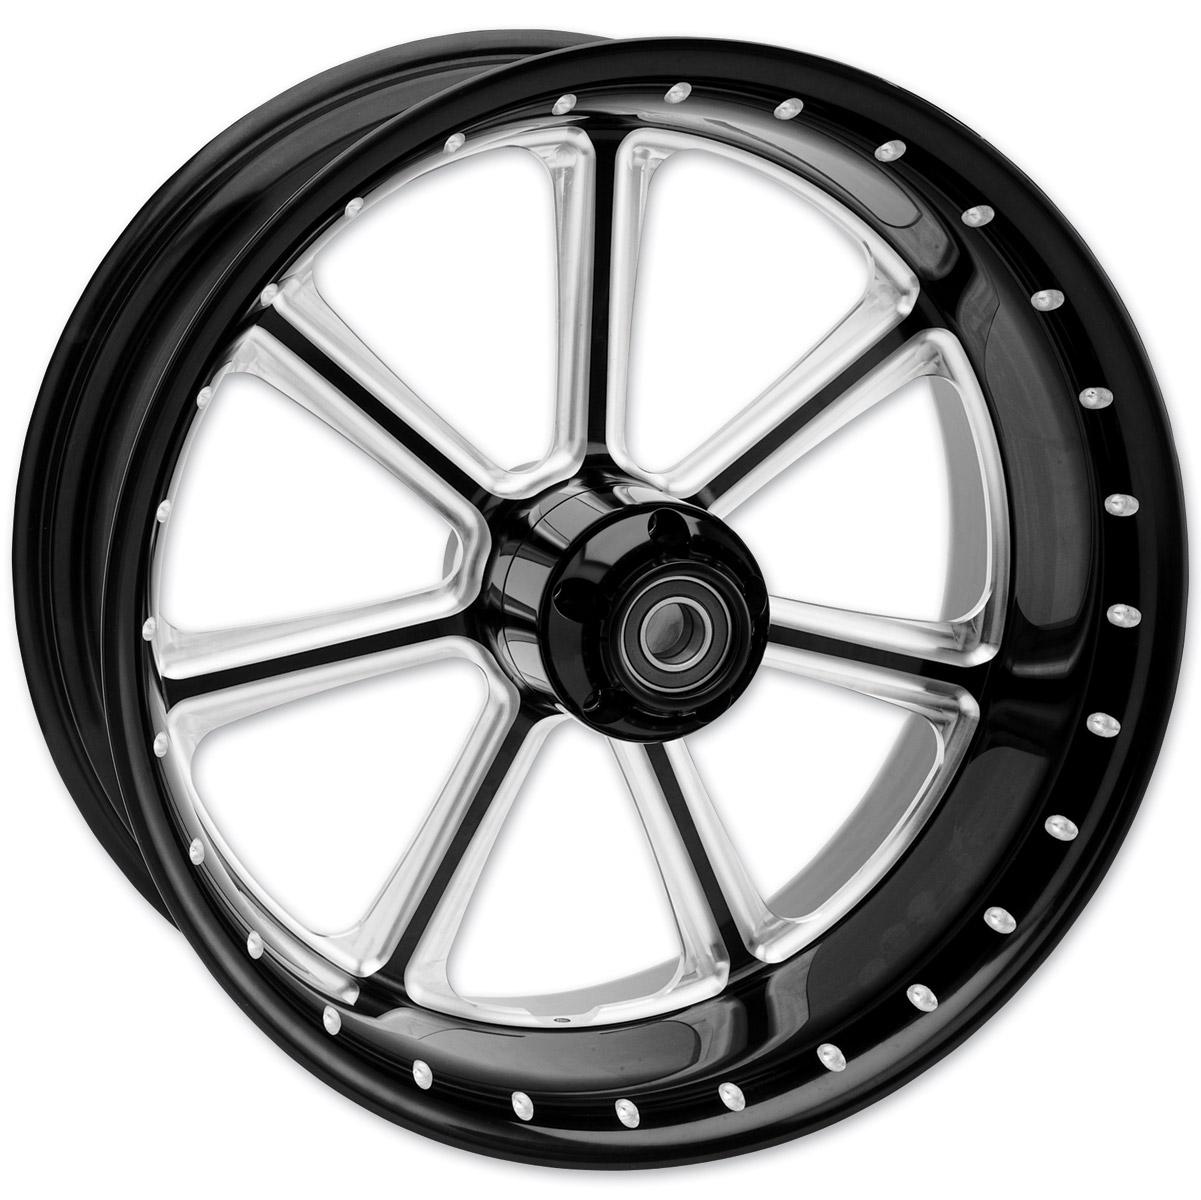 Roland Sands Design Contrast Cut Diesel Front Wheel, 23″ x 3.5″